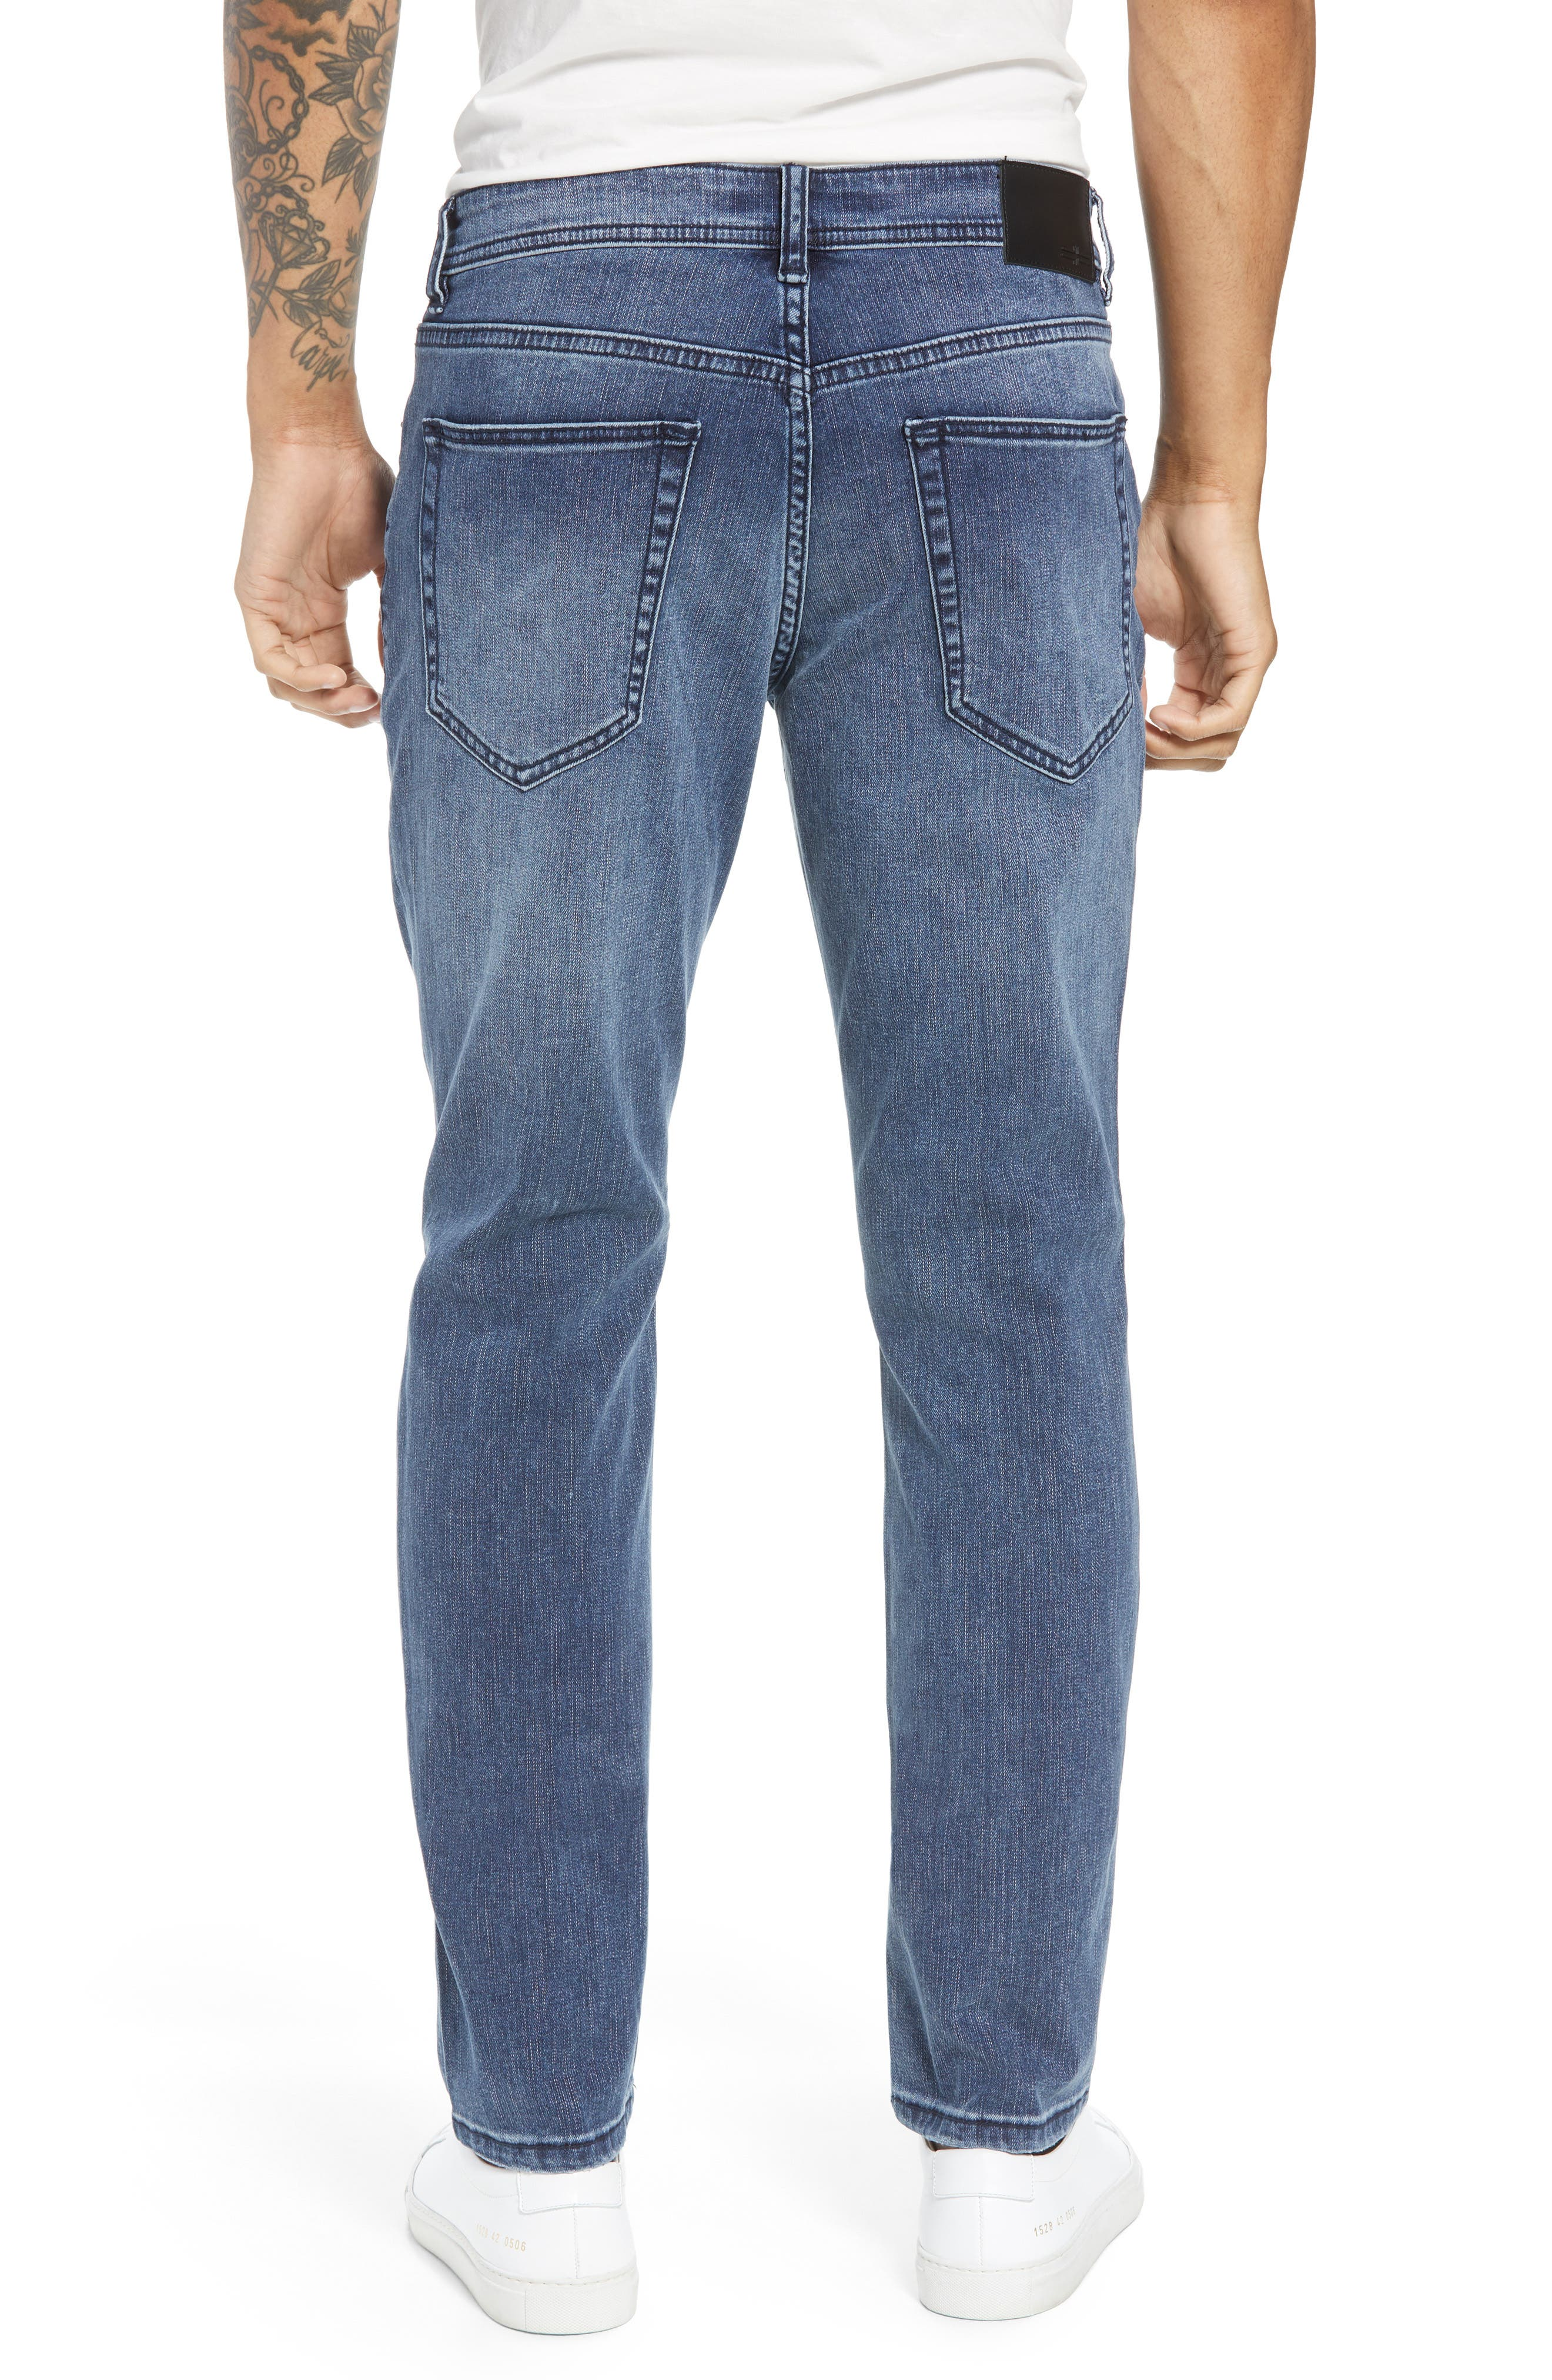 Jeans Co. Slim Straight Leg Jeans,                             Alternate thumbnail 2, color,                             Southaven Mid Blue